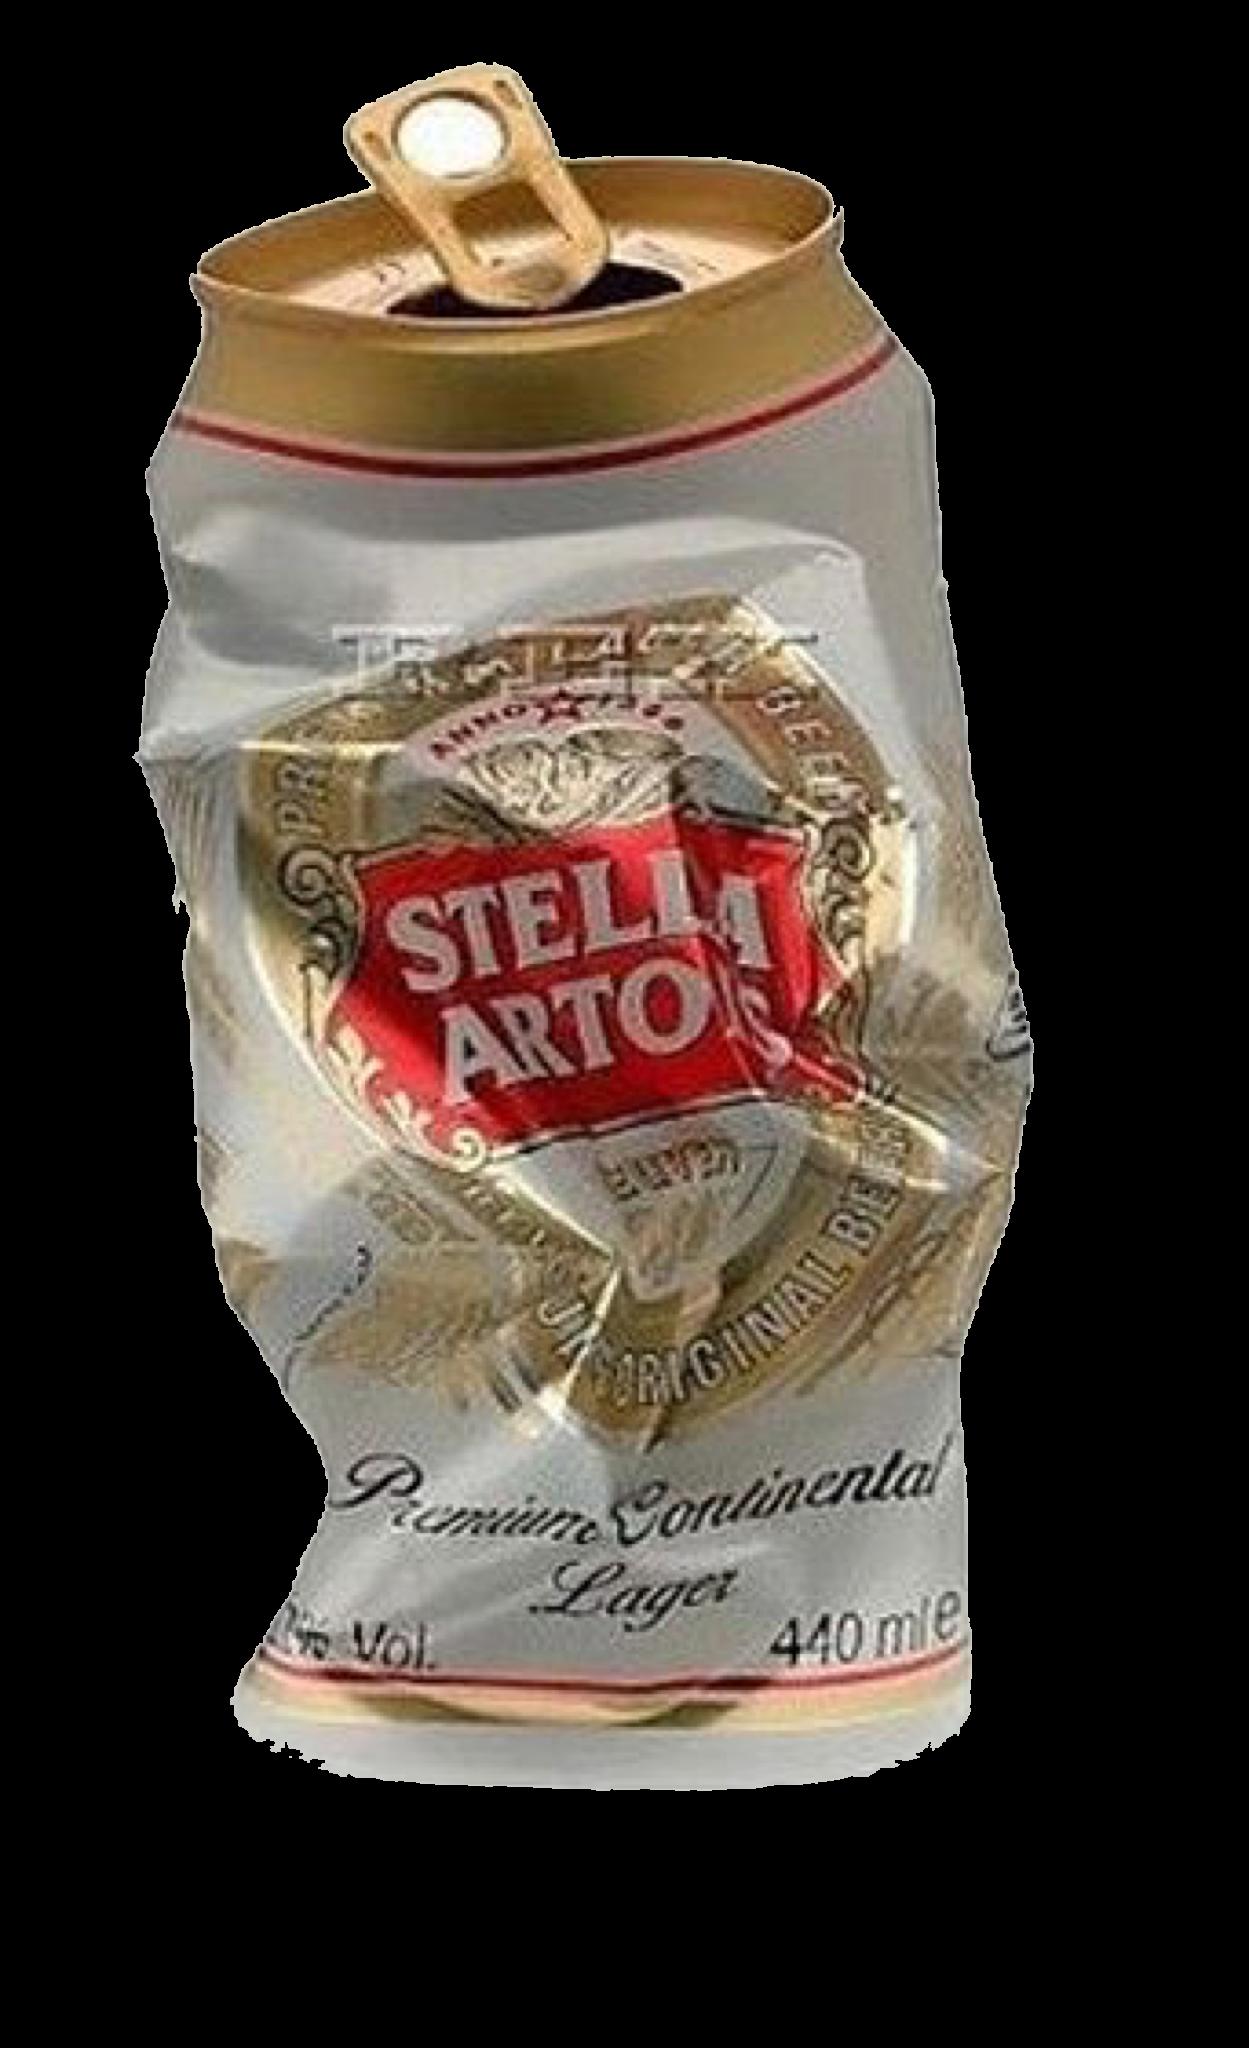 Beer Can Beige Alcohol Polyvore Moodboard Filler Drink Mood Boards Alchohol Mood Board